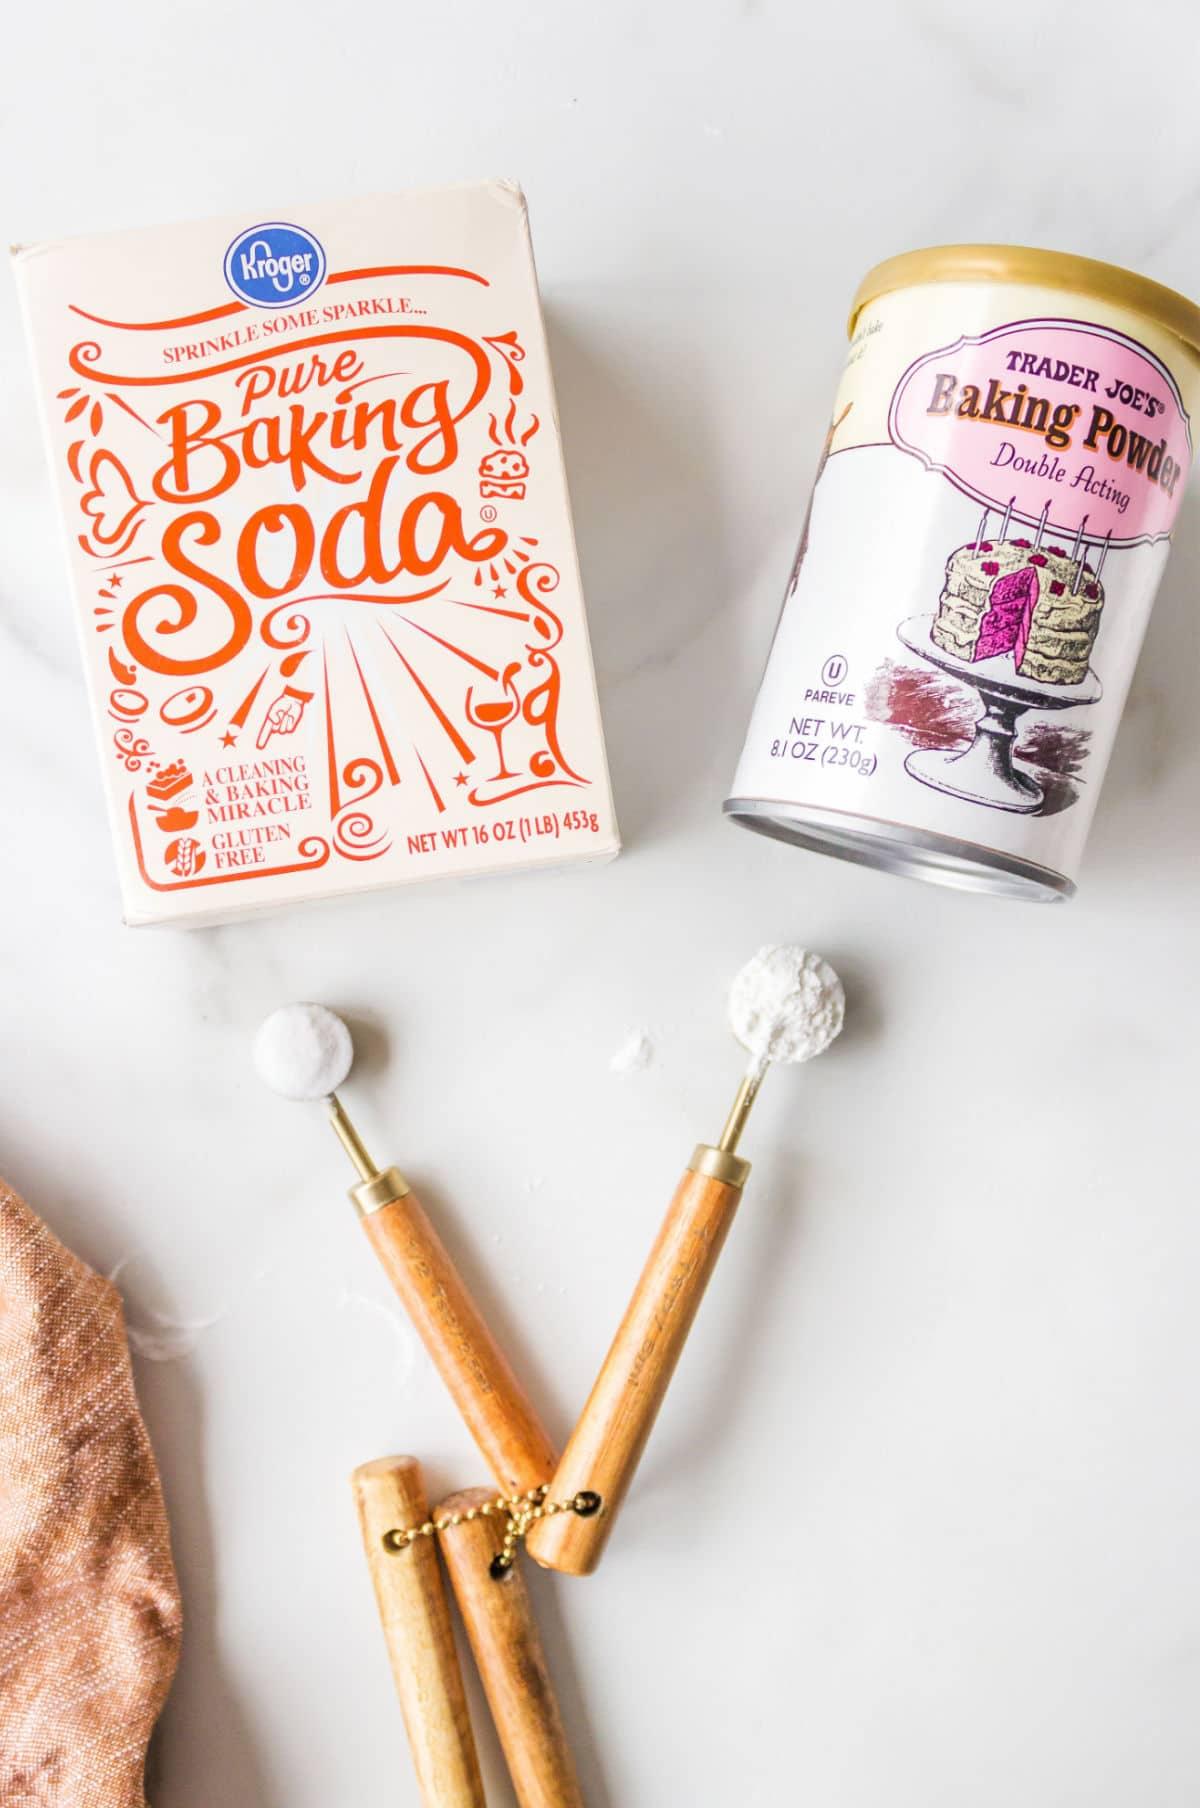 Box of baking soda next to a can of baking powder.